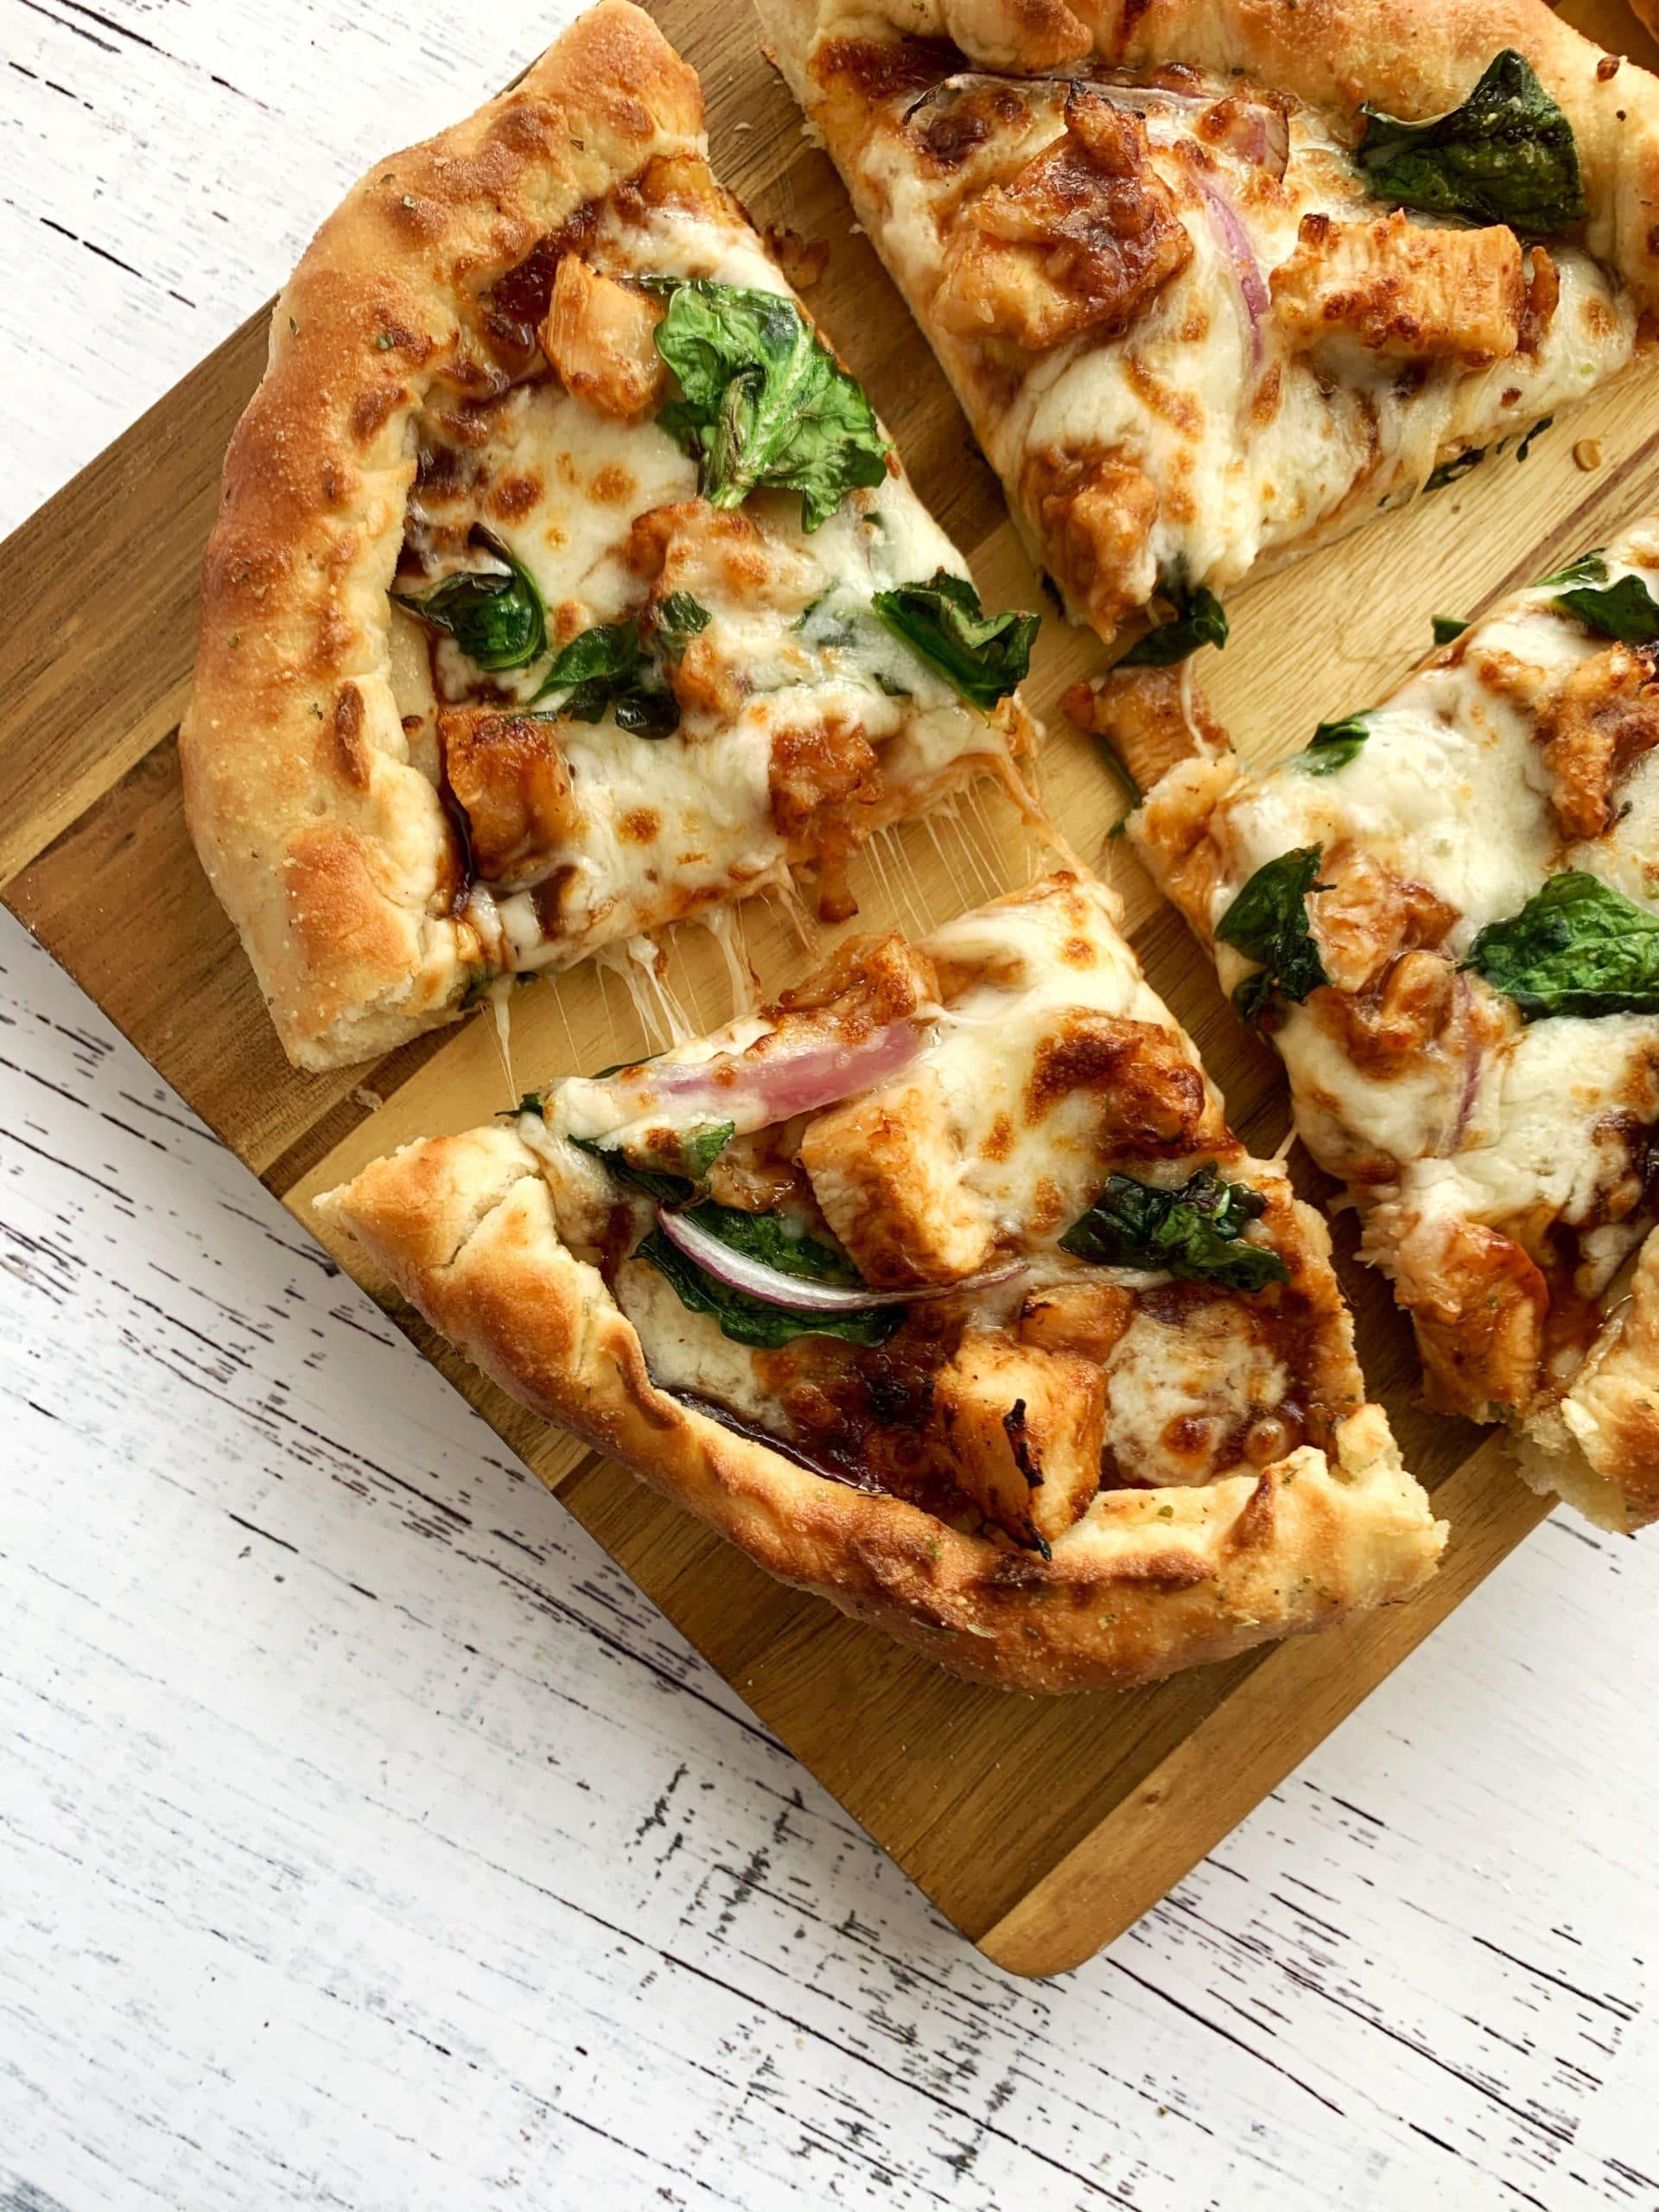 BBQ chicken pizza on a wooden slab